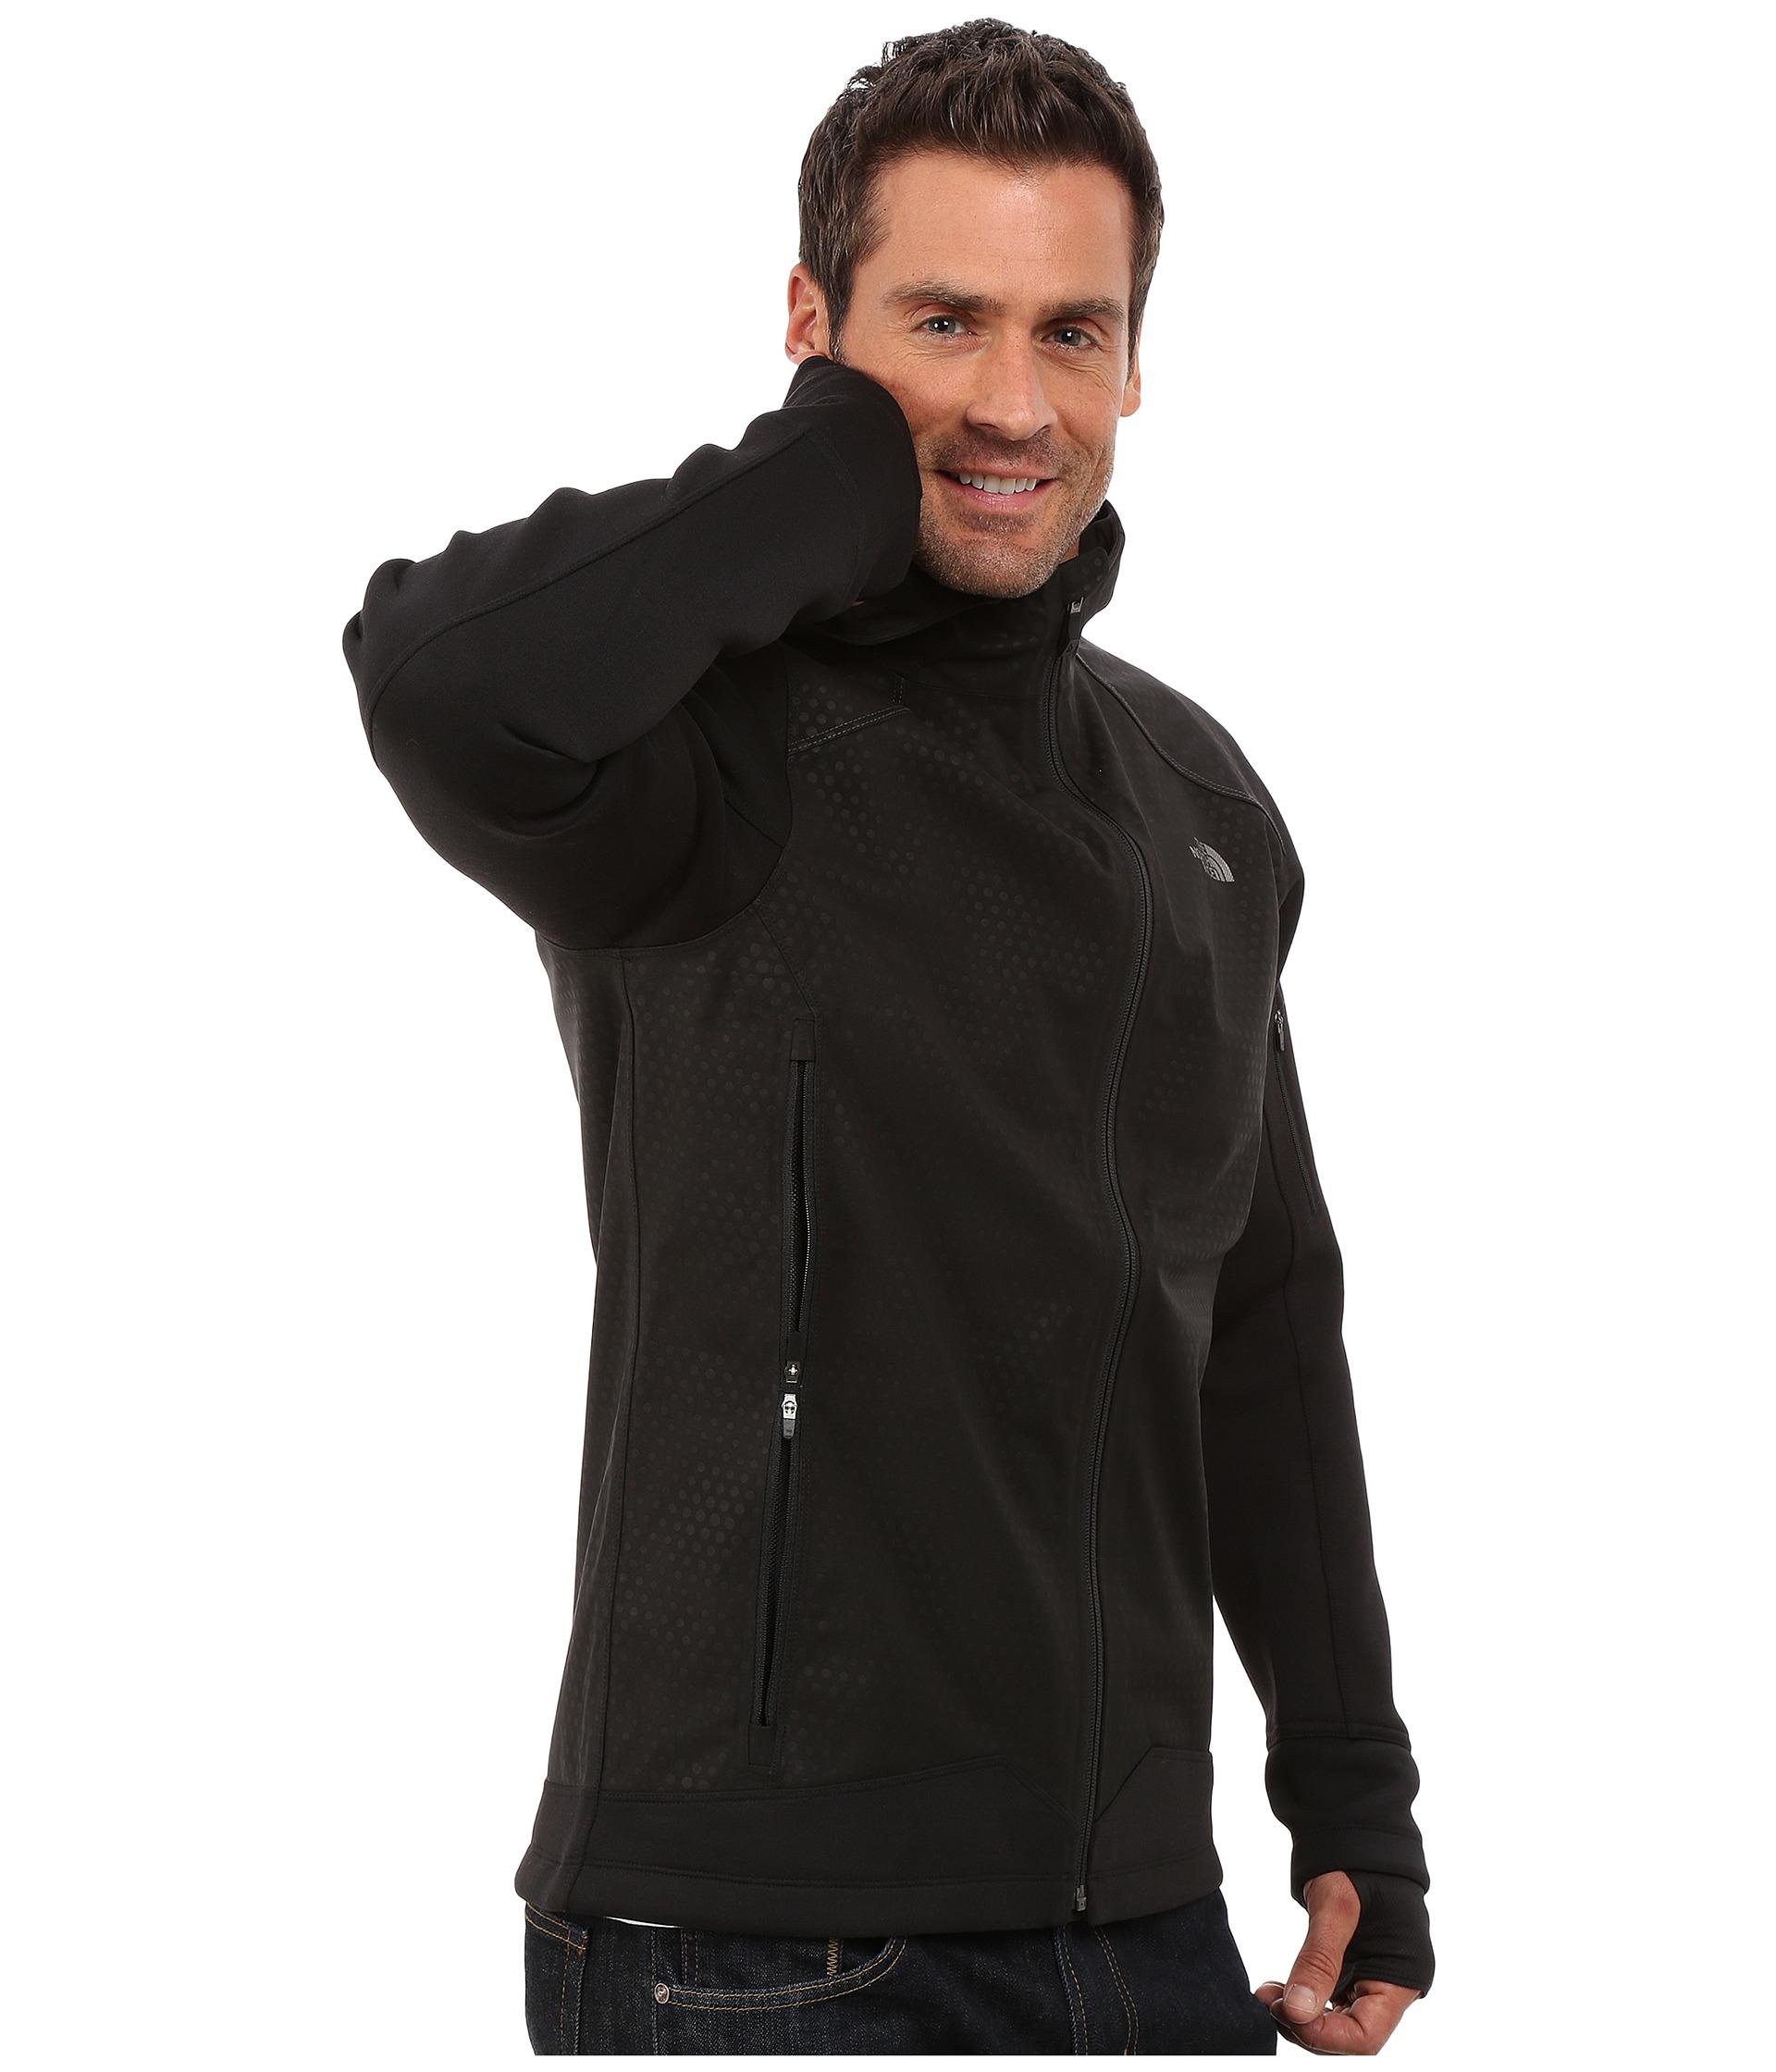 f83b6e982d1d Lyst - The North Face Kilowatt Ops Jacket in Black for Men